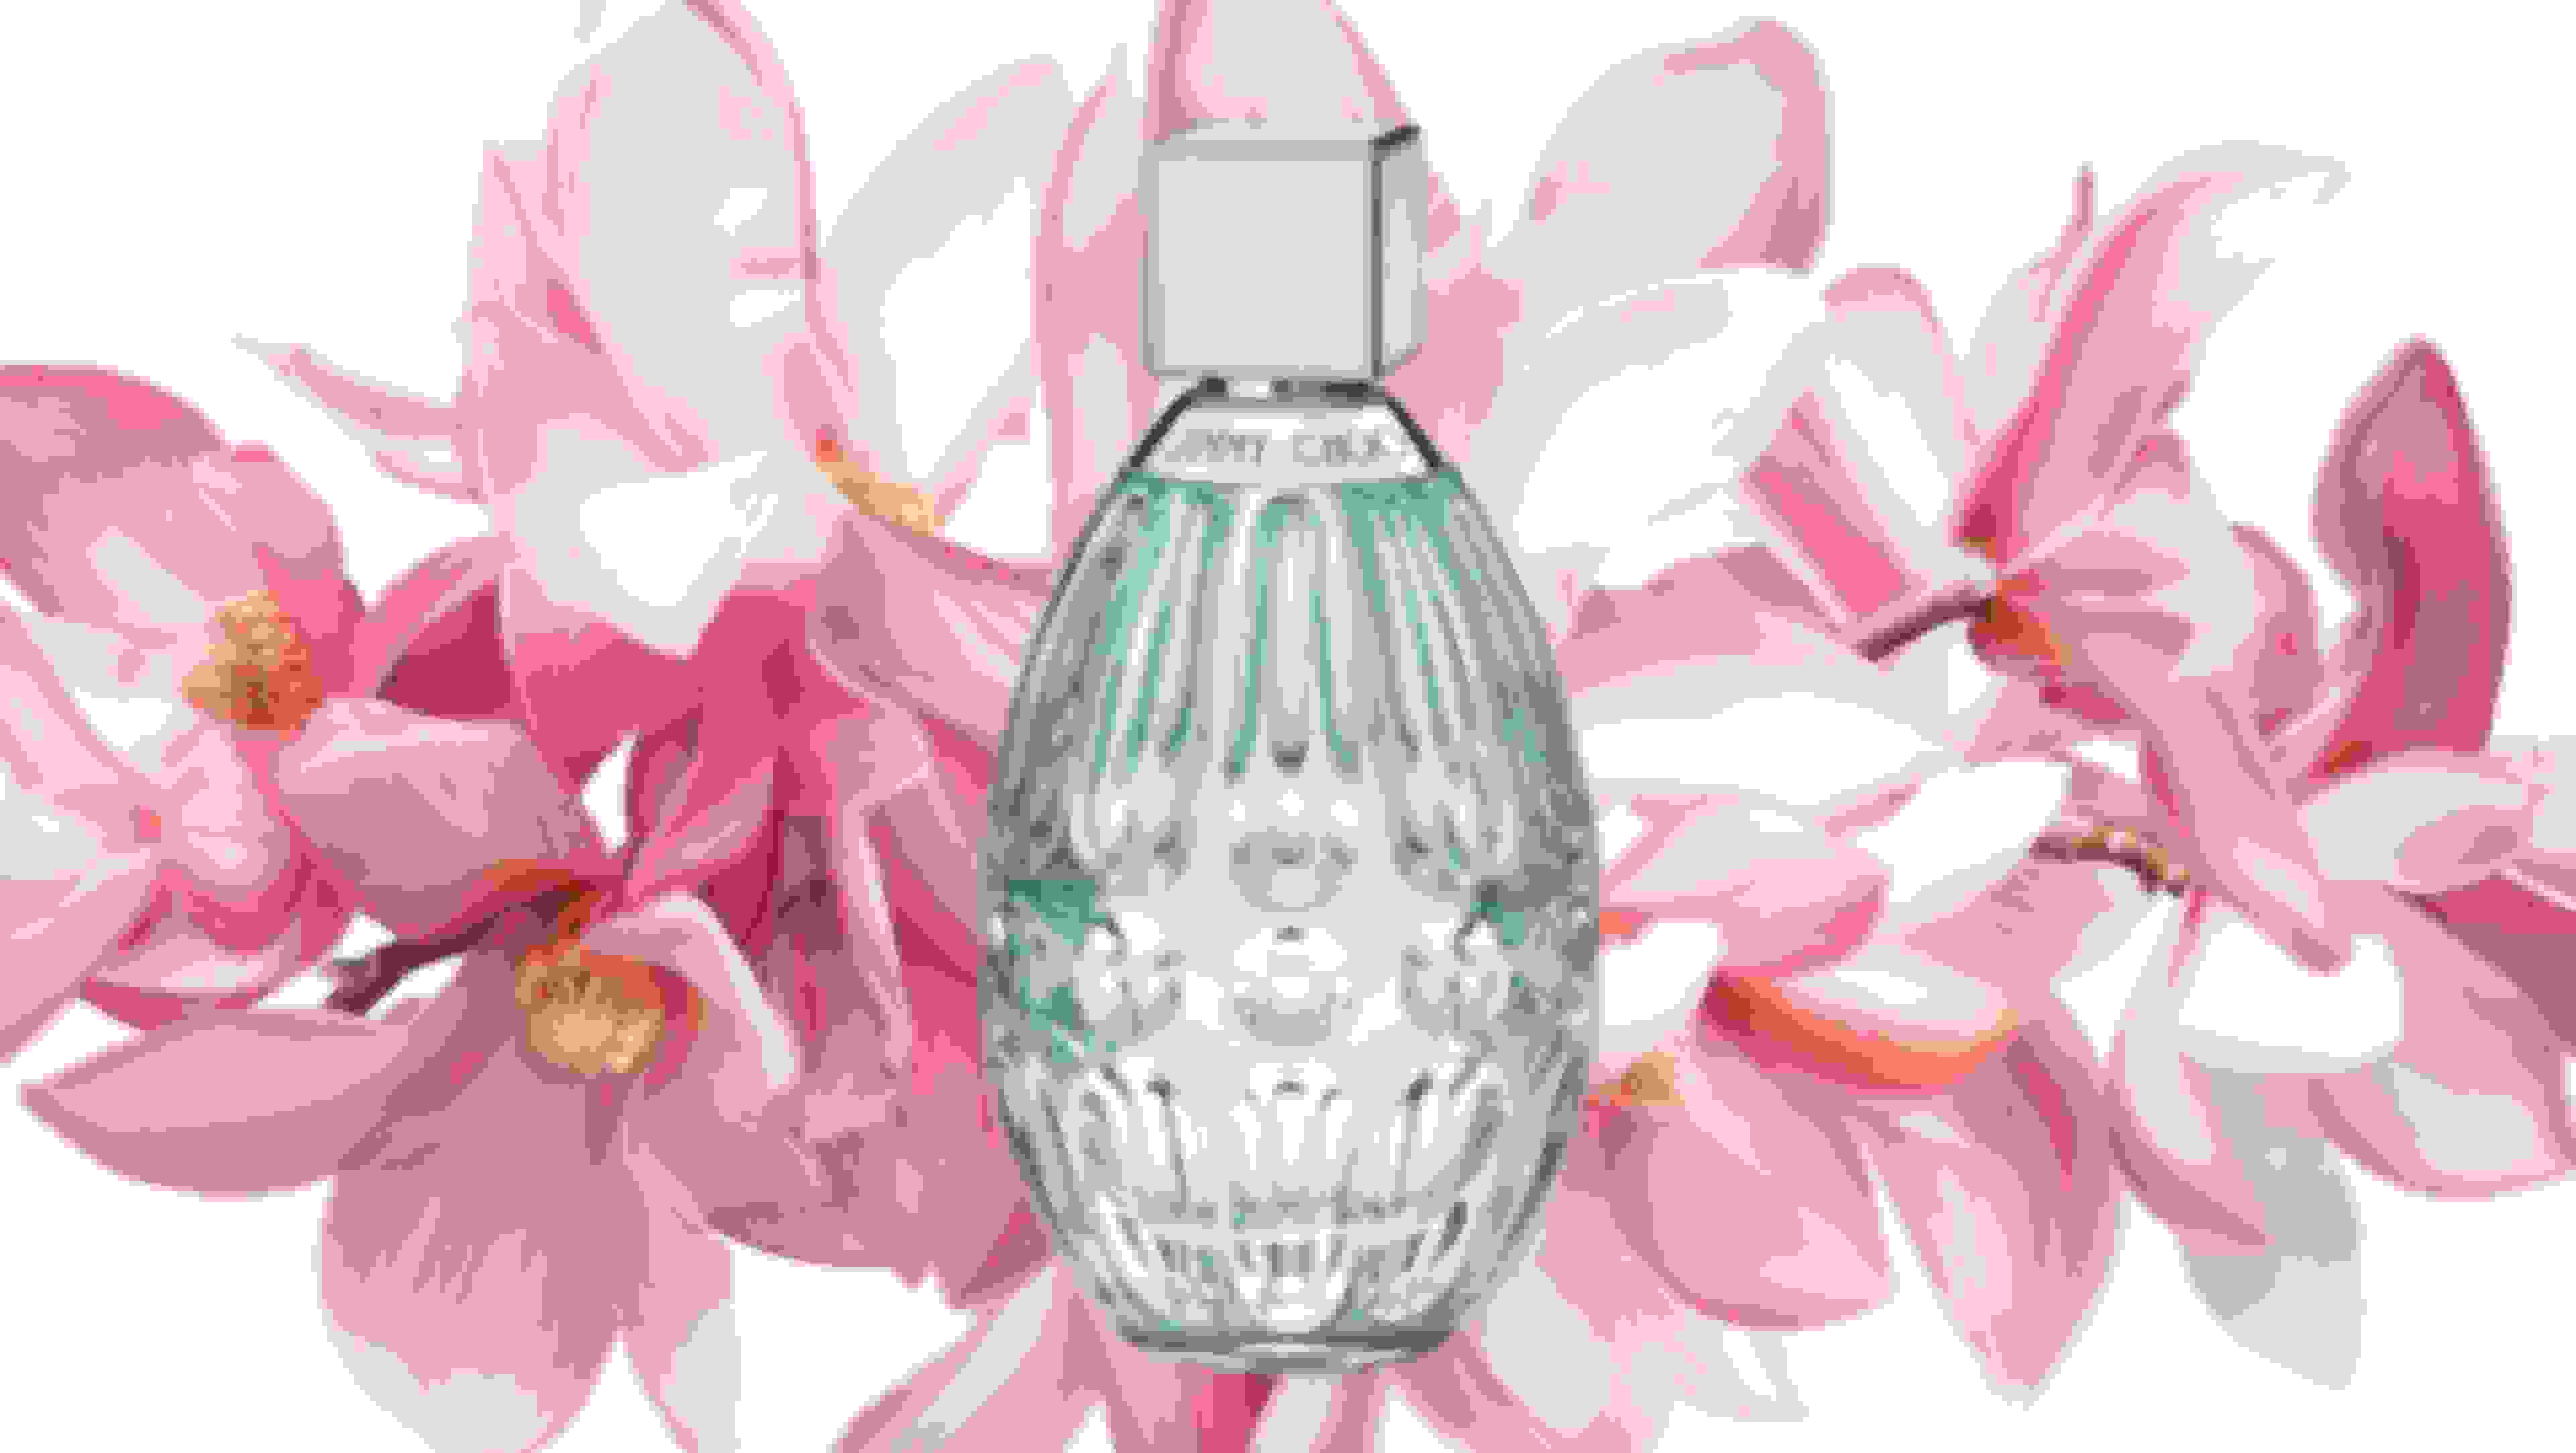 Jimmy Choo: Floral fragrance